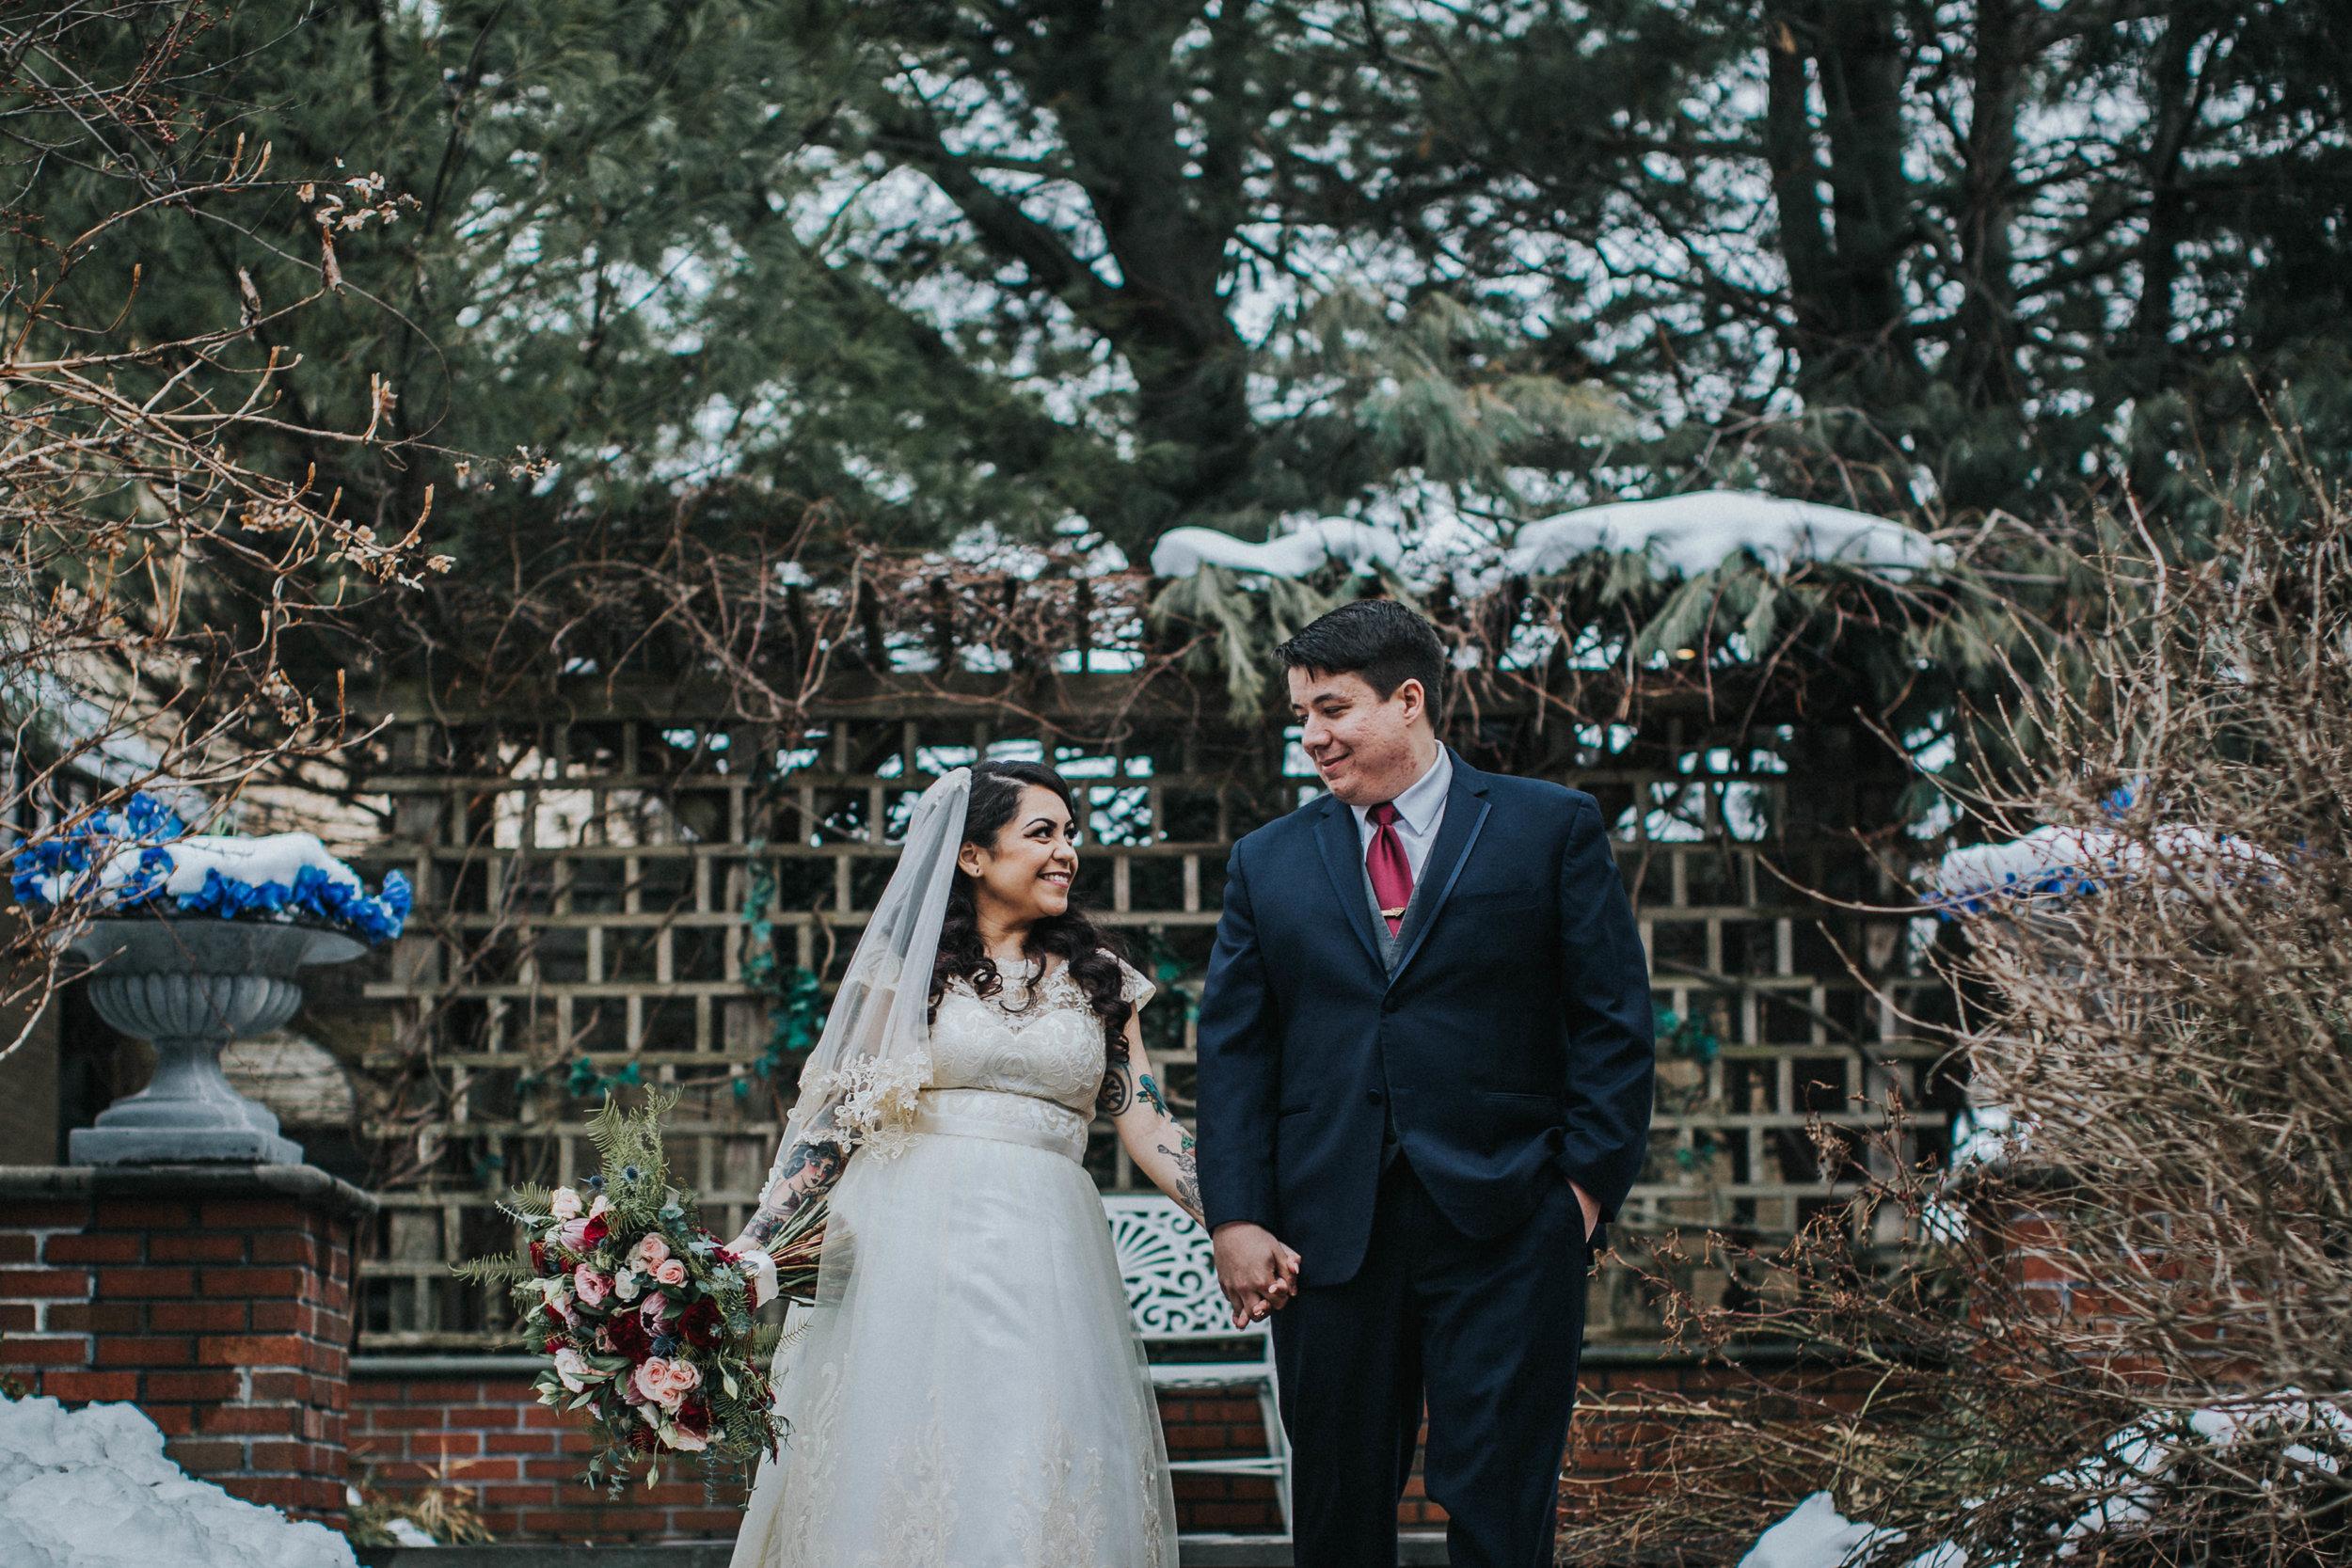 New-Jersey-Wedding-Photographer-ReceptionCenter-Valeria&Mike-First-Look-Bride&Groom (37 of 69).jpg